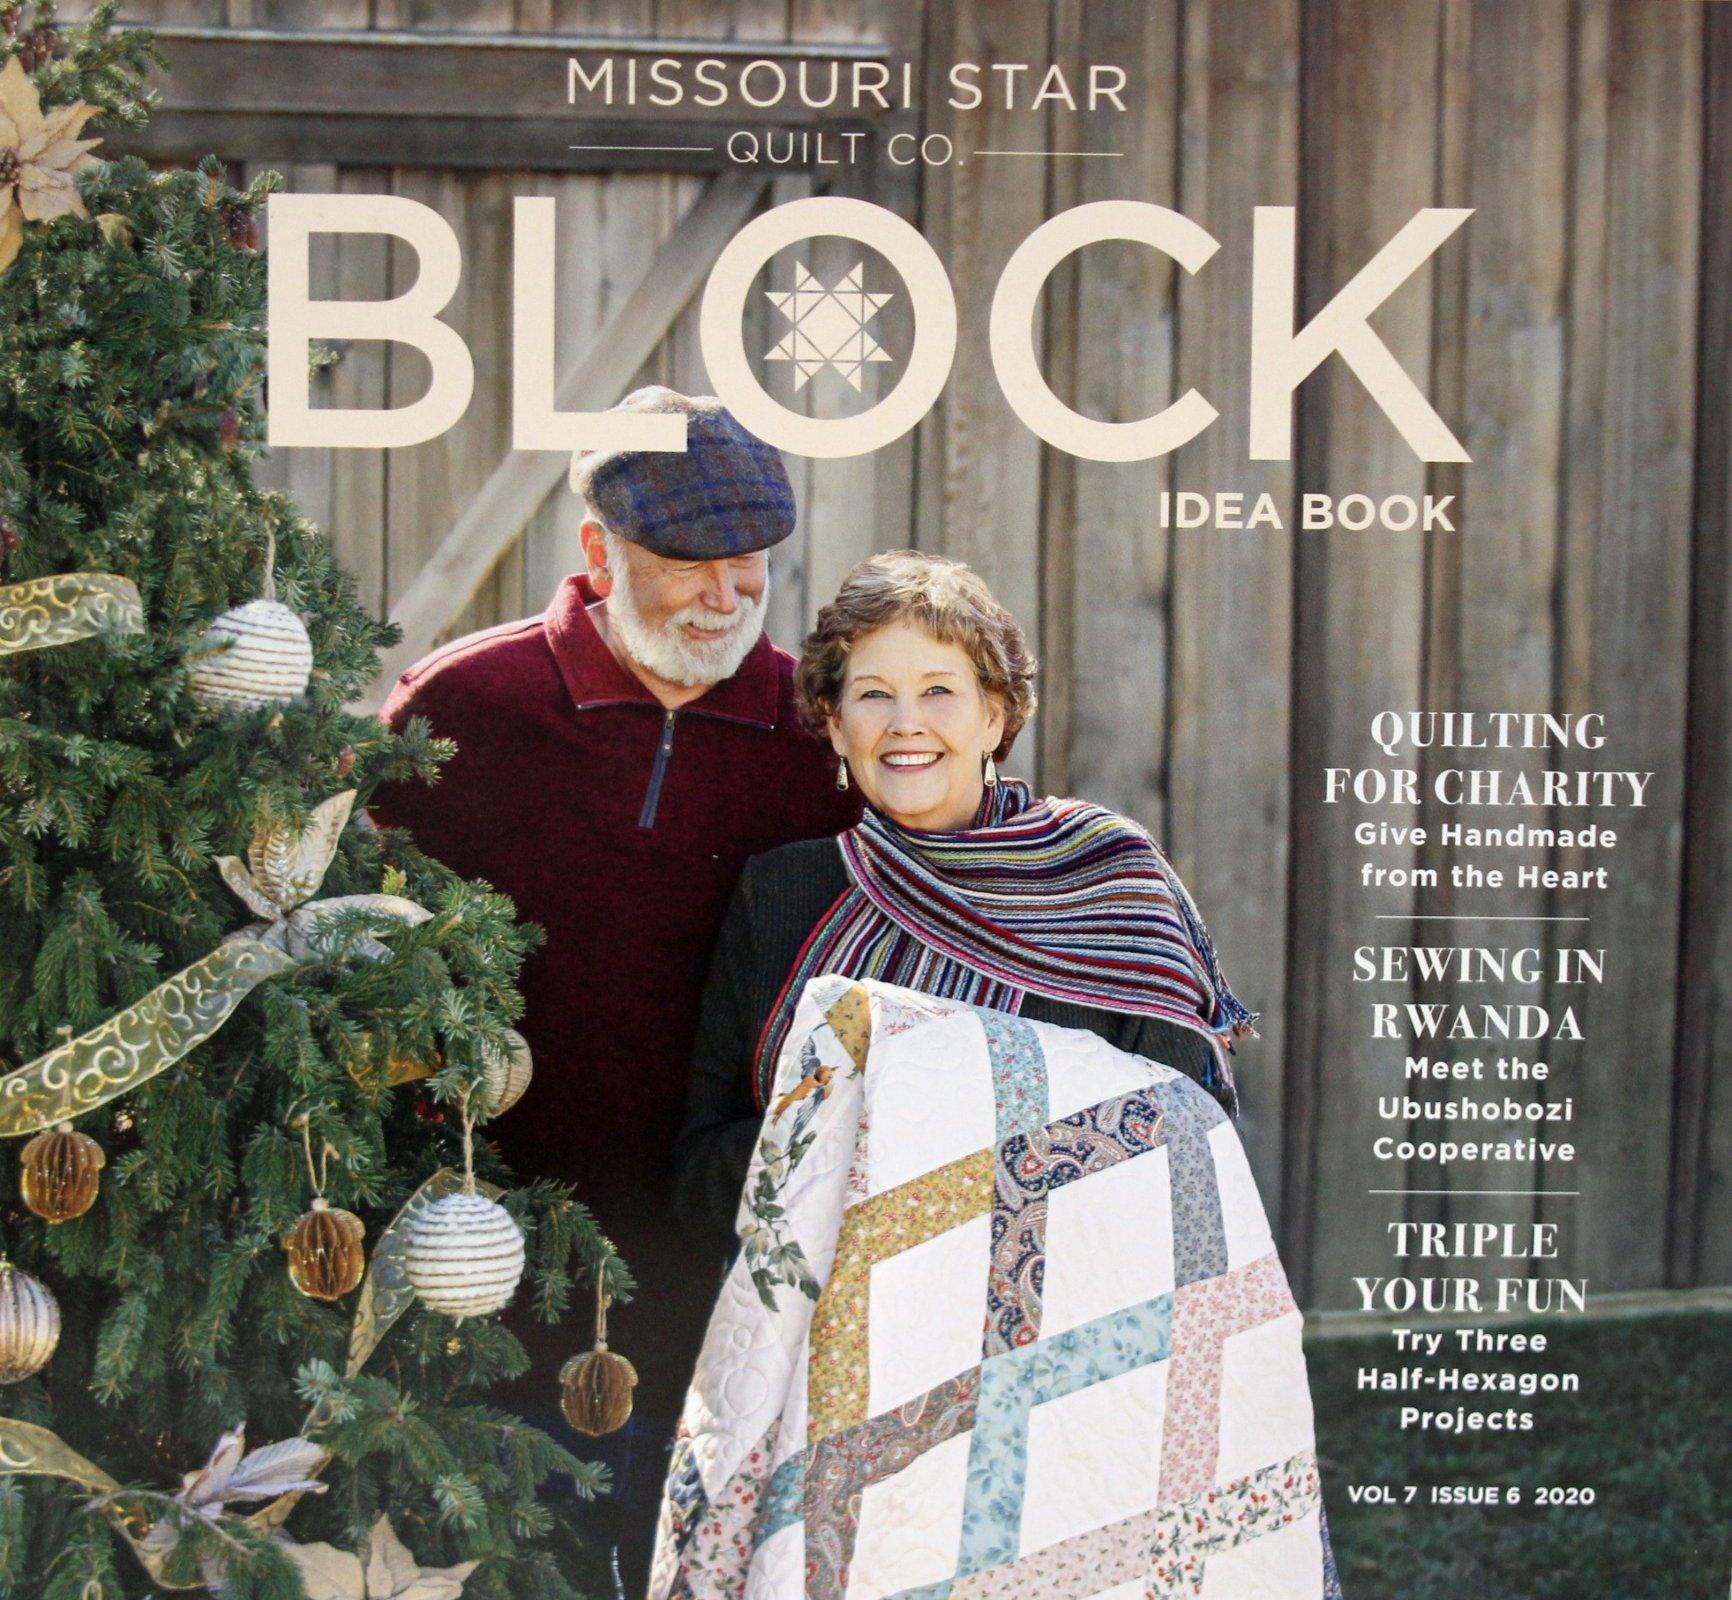 Block Idea Book, vol. 7, issue 6 2020